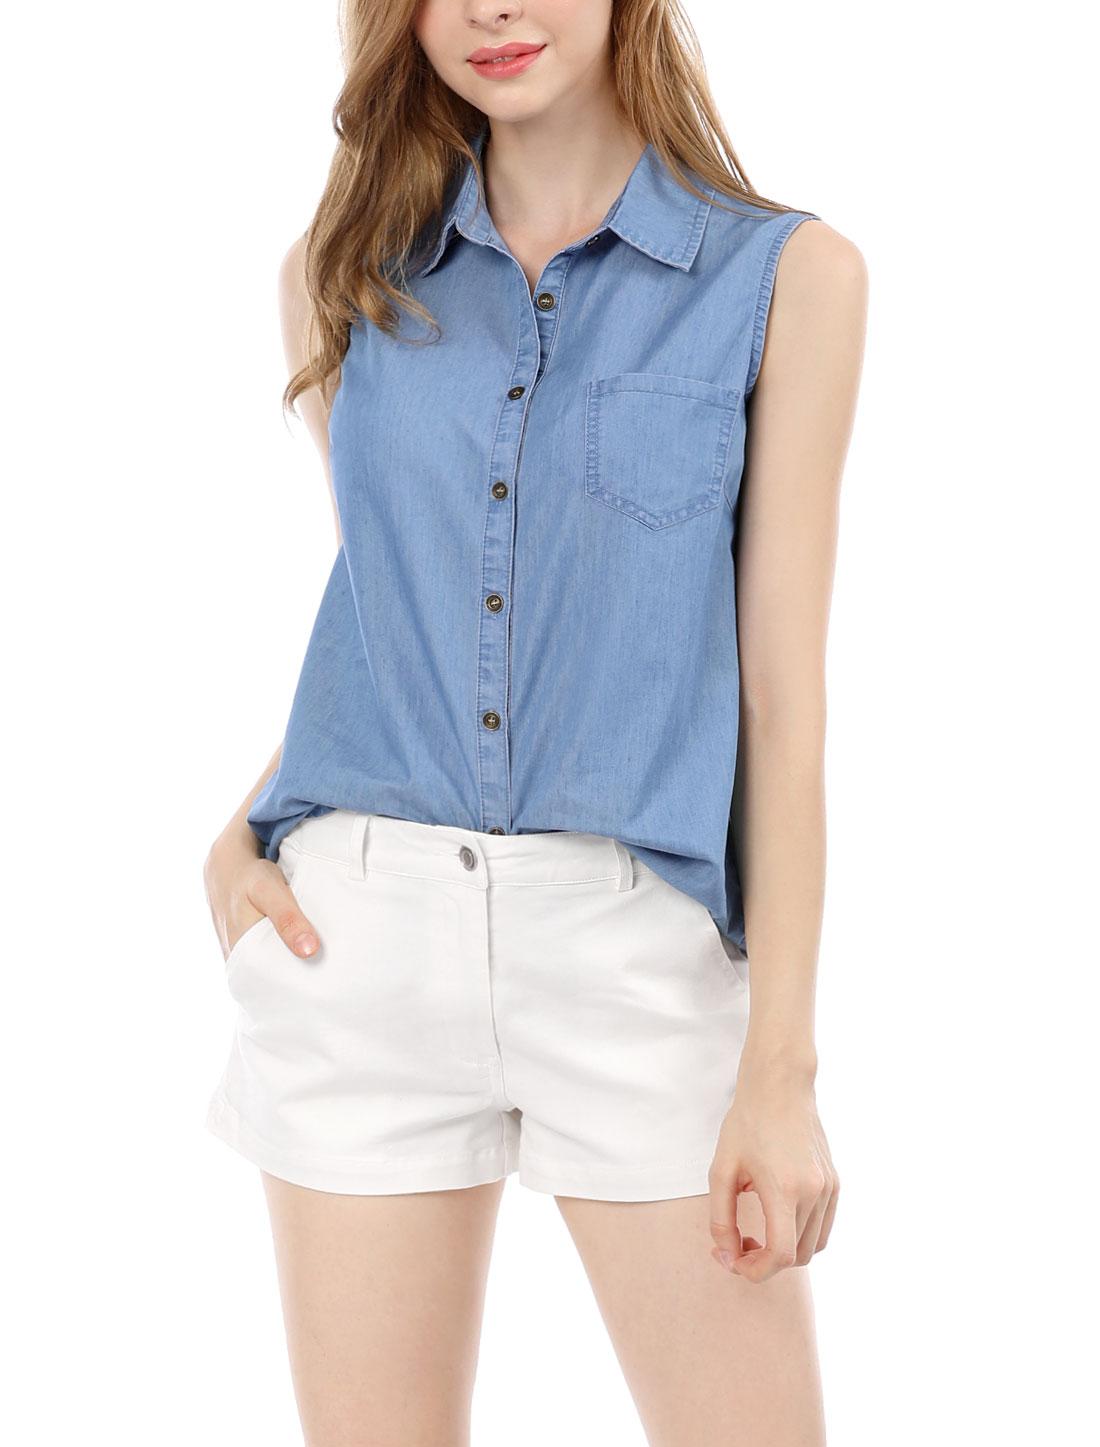 Allegra K Women Single Breasted Collar Sleeveless Shirt Blue S